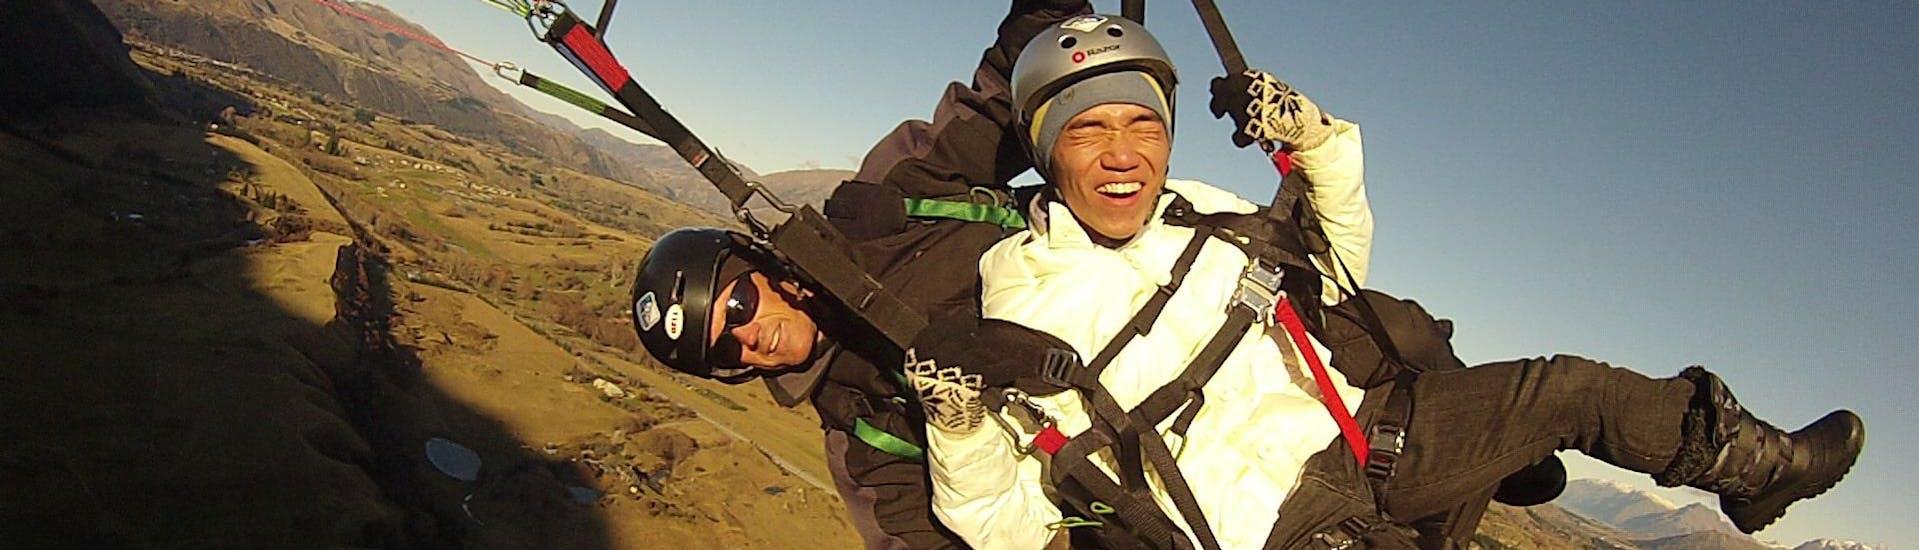 "Tandem Paragliding ""Adventure"" - Lazio with Sky Experience - Hero image"